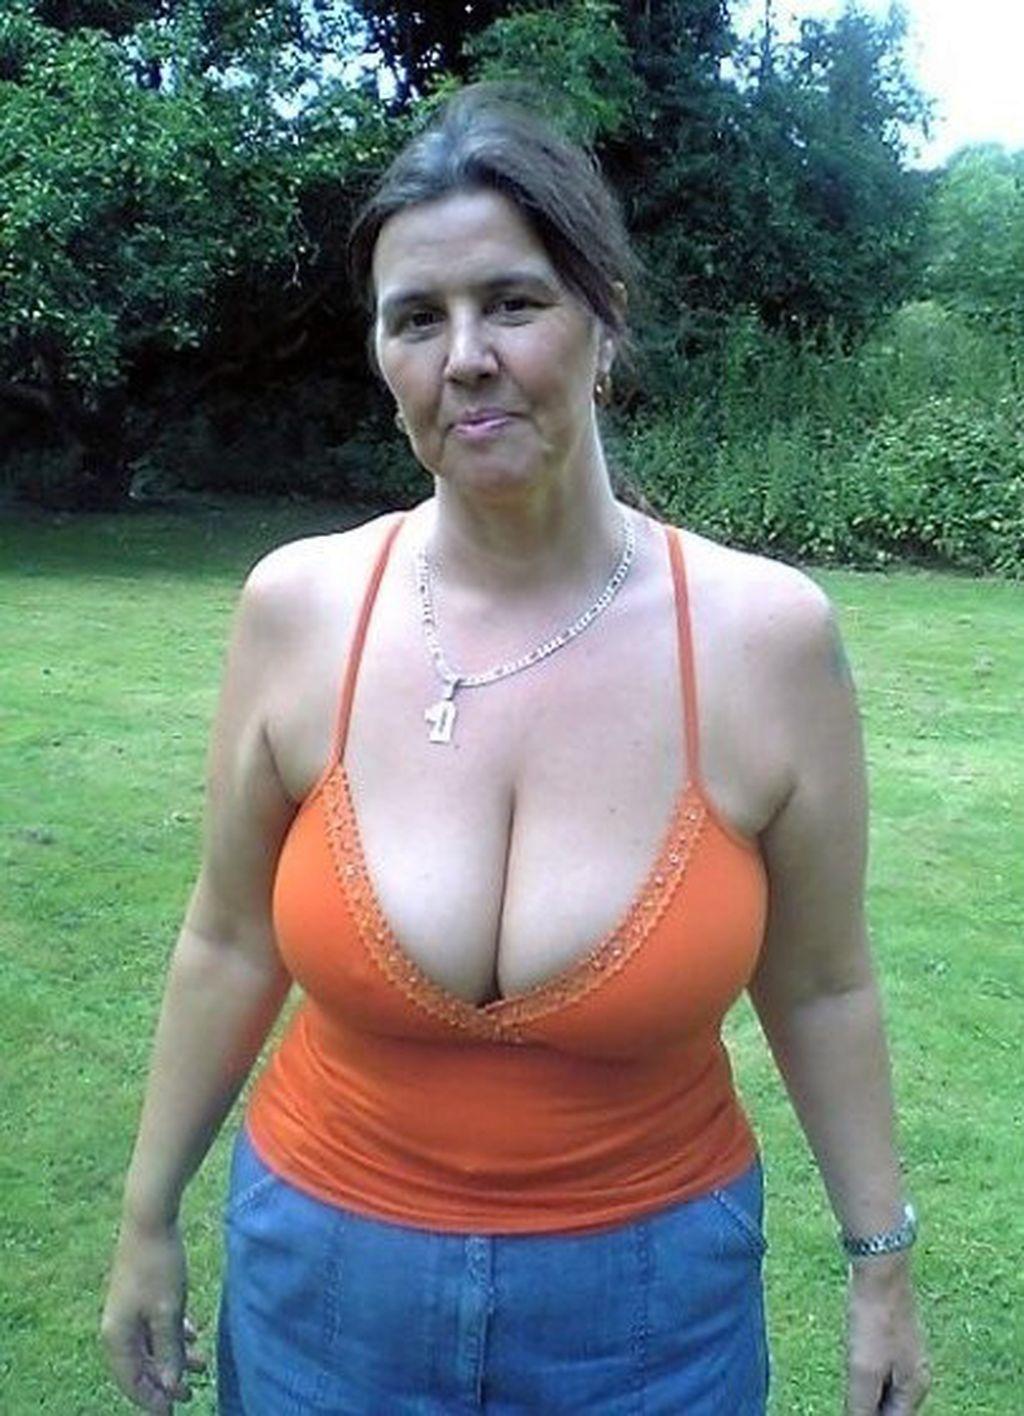 Breast fondling pics